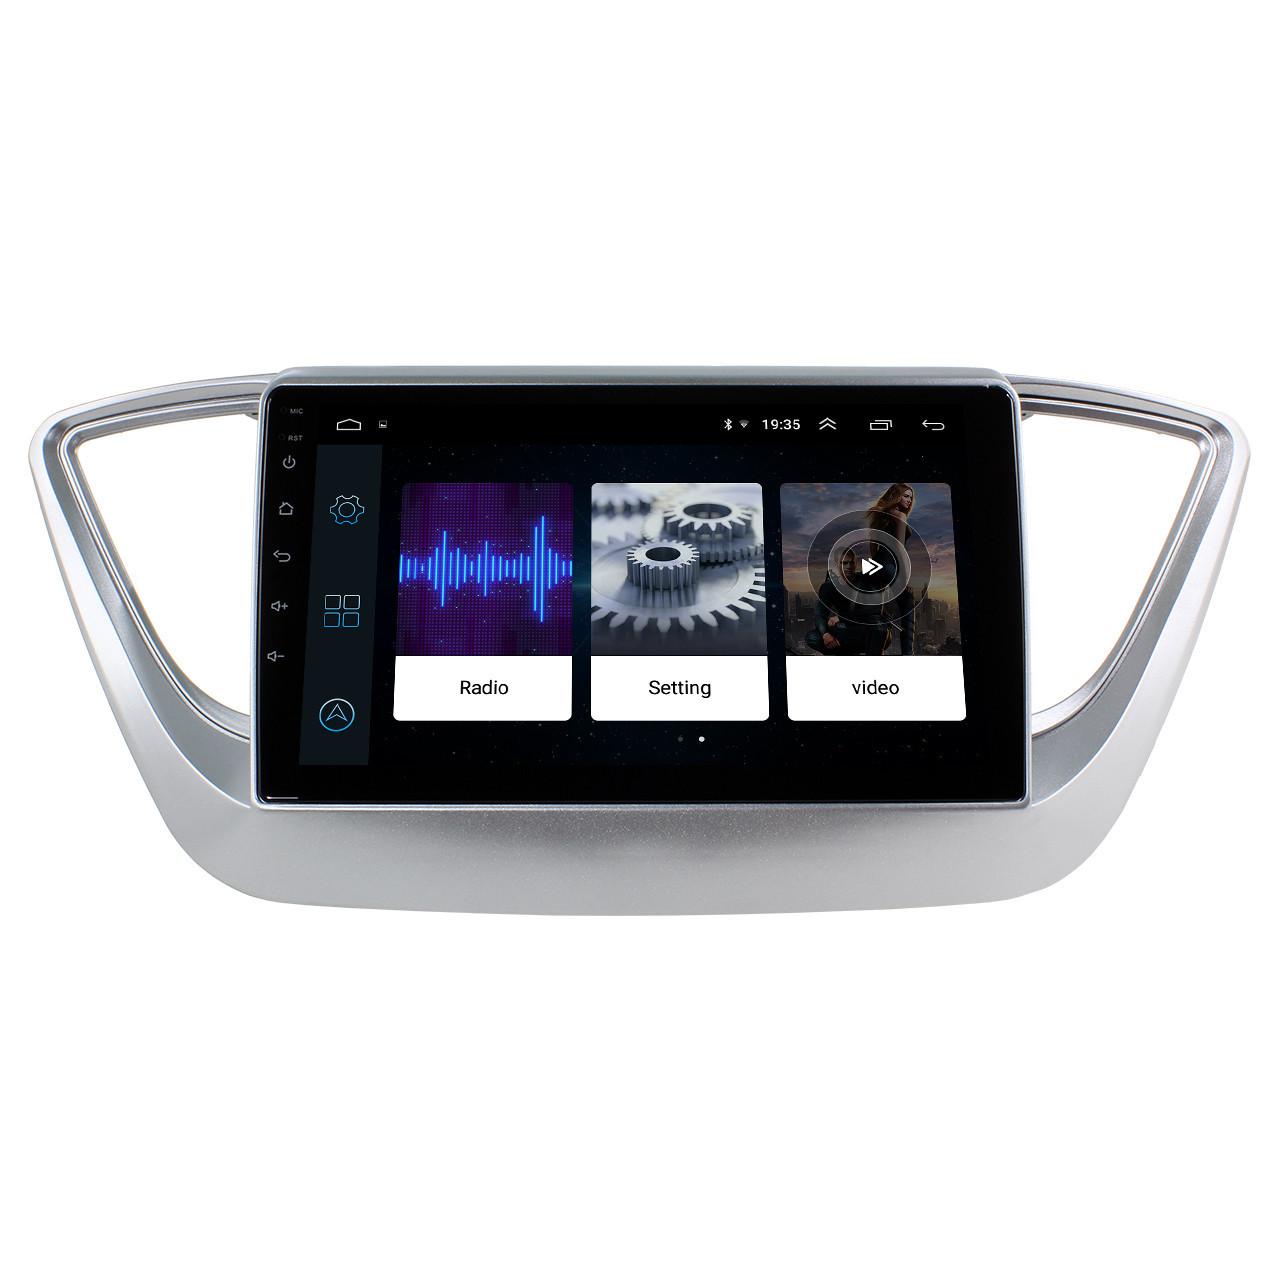 Штатная автомобильная магнитола 9 Hyundai Accent (2017г.) 2/32Gb GPS Android (4353-12703)